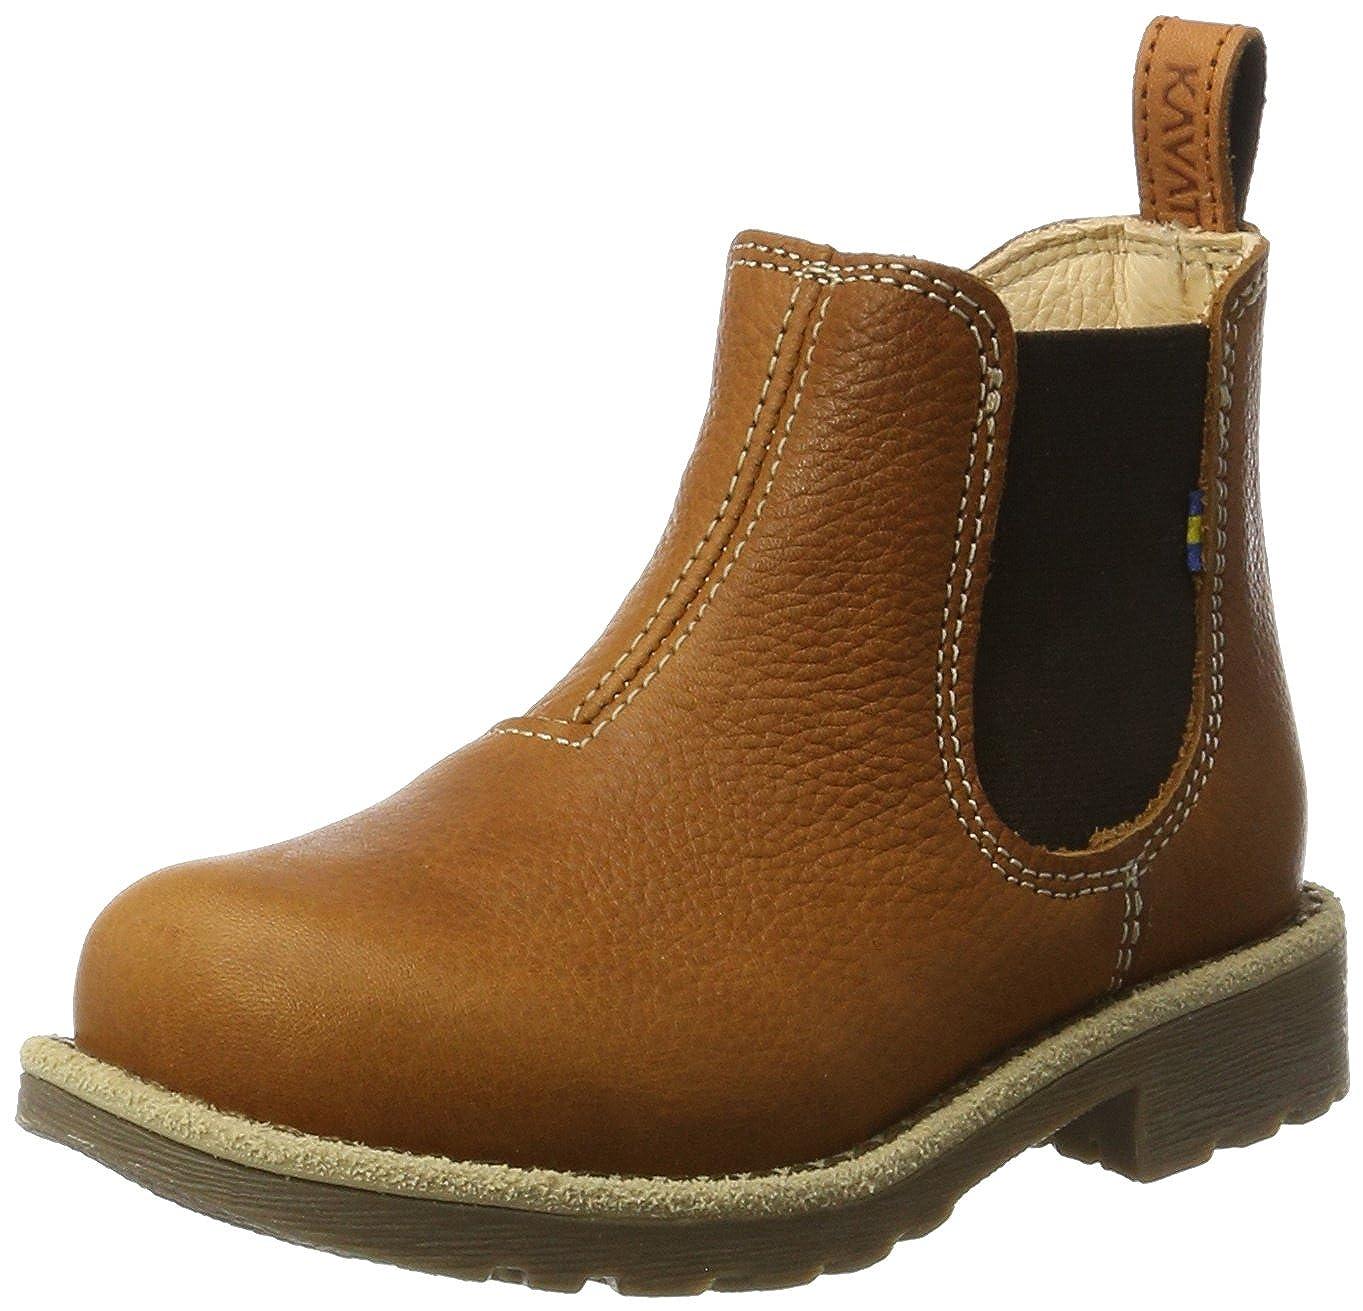 059c3bc3704ba Kavat Kids' Husum Ep Chelsea Boots Braun (Dark Brown): Amazon.co.uk ...